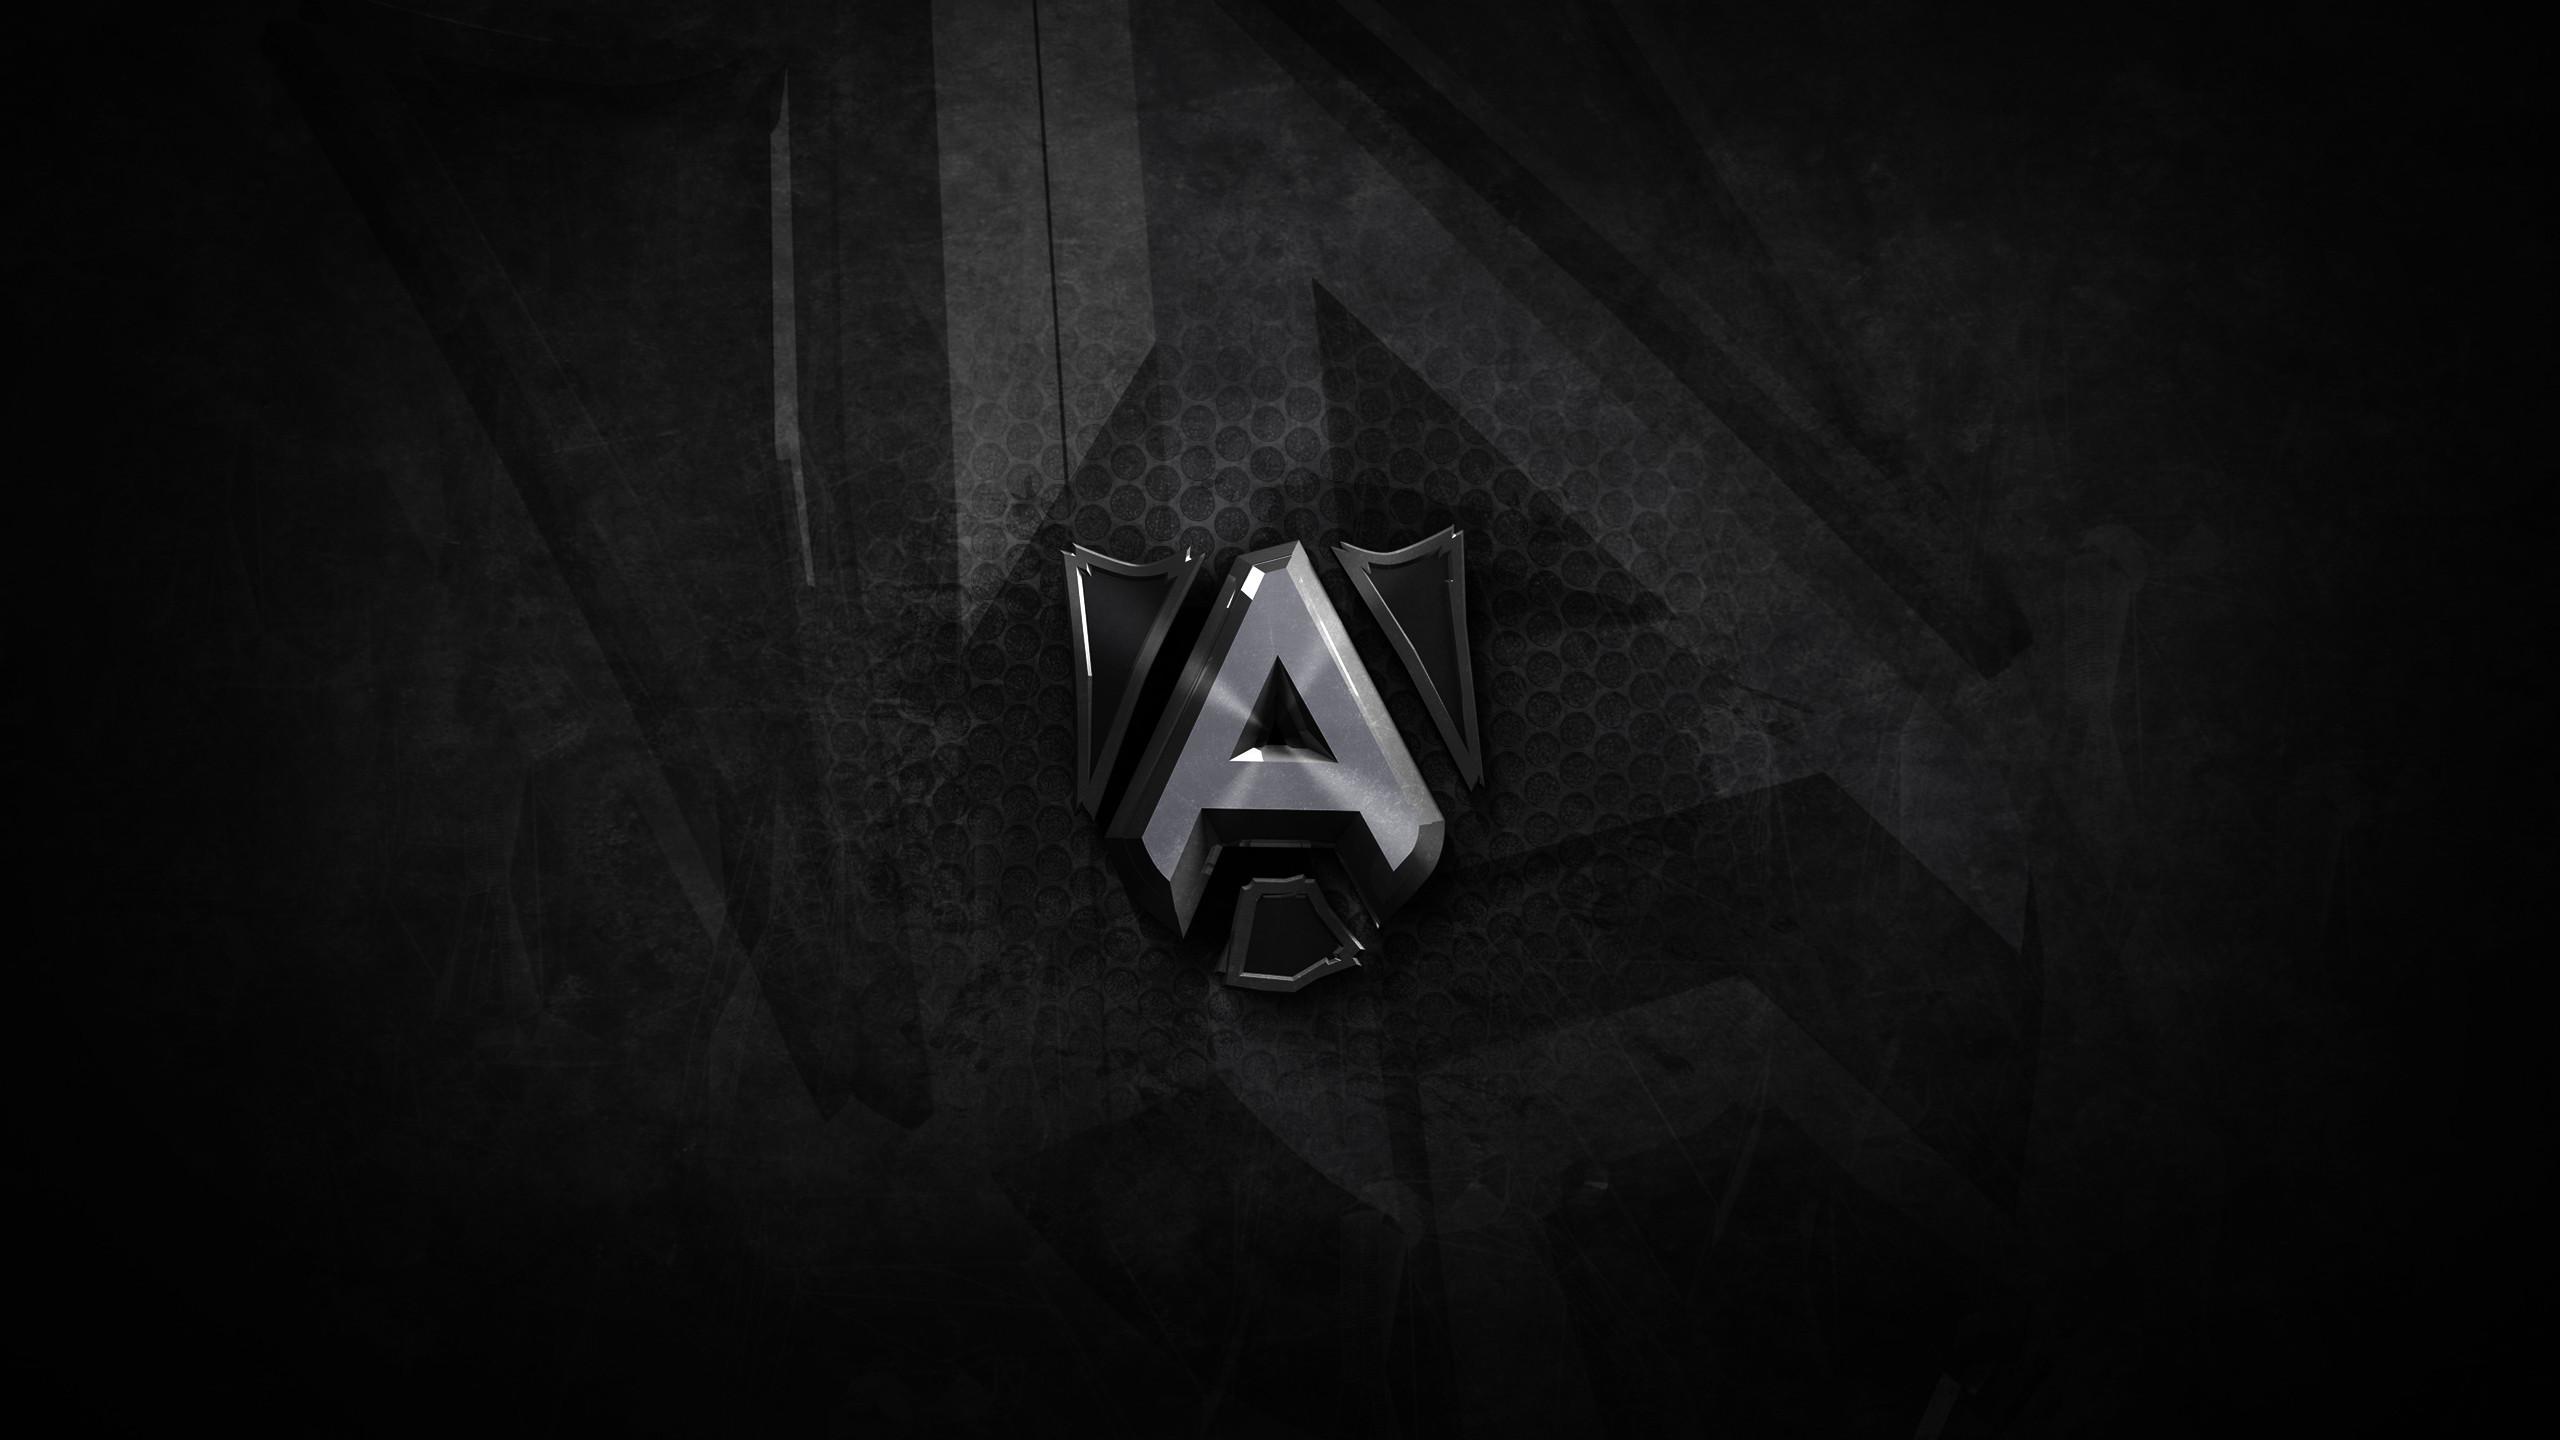 VALORANT : kAdavra quitte Alliance